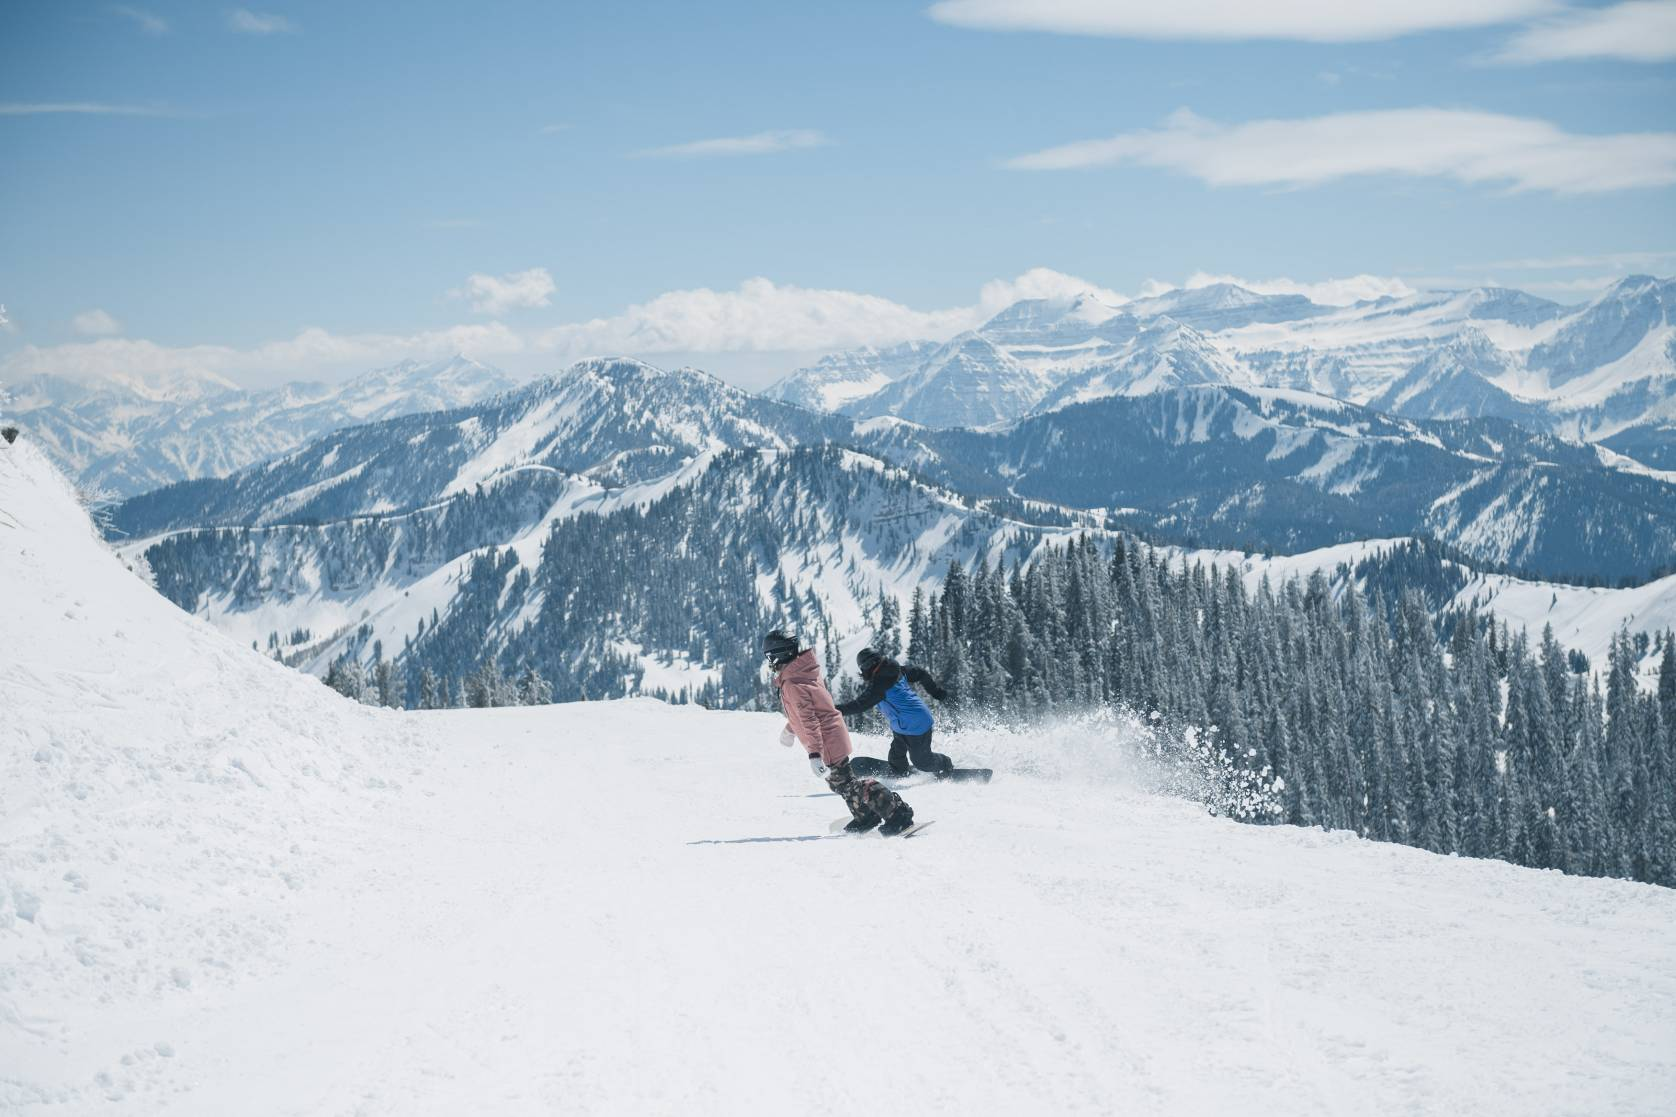 Snowboard Mountain Backcountry Big Brand Sale